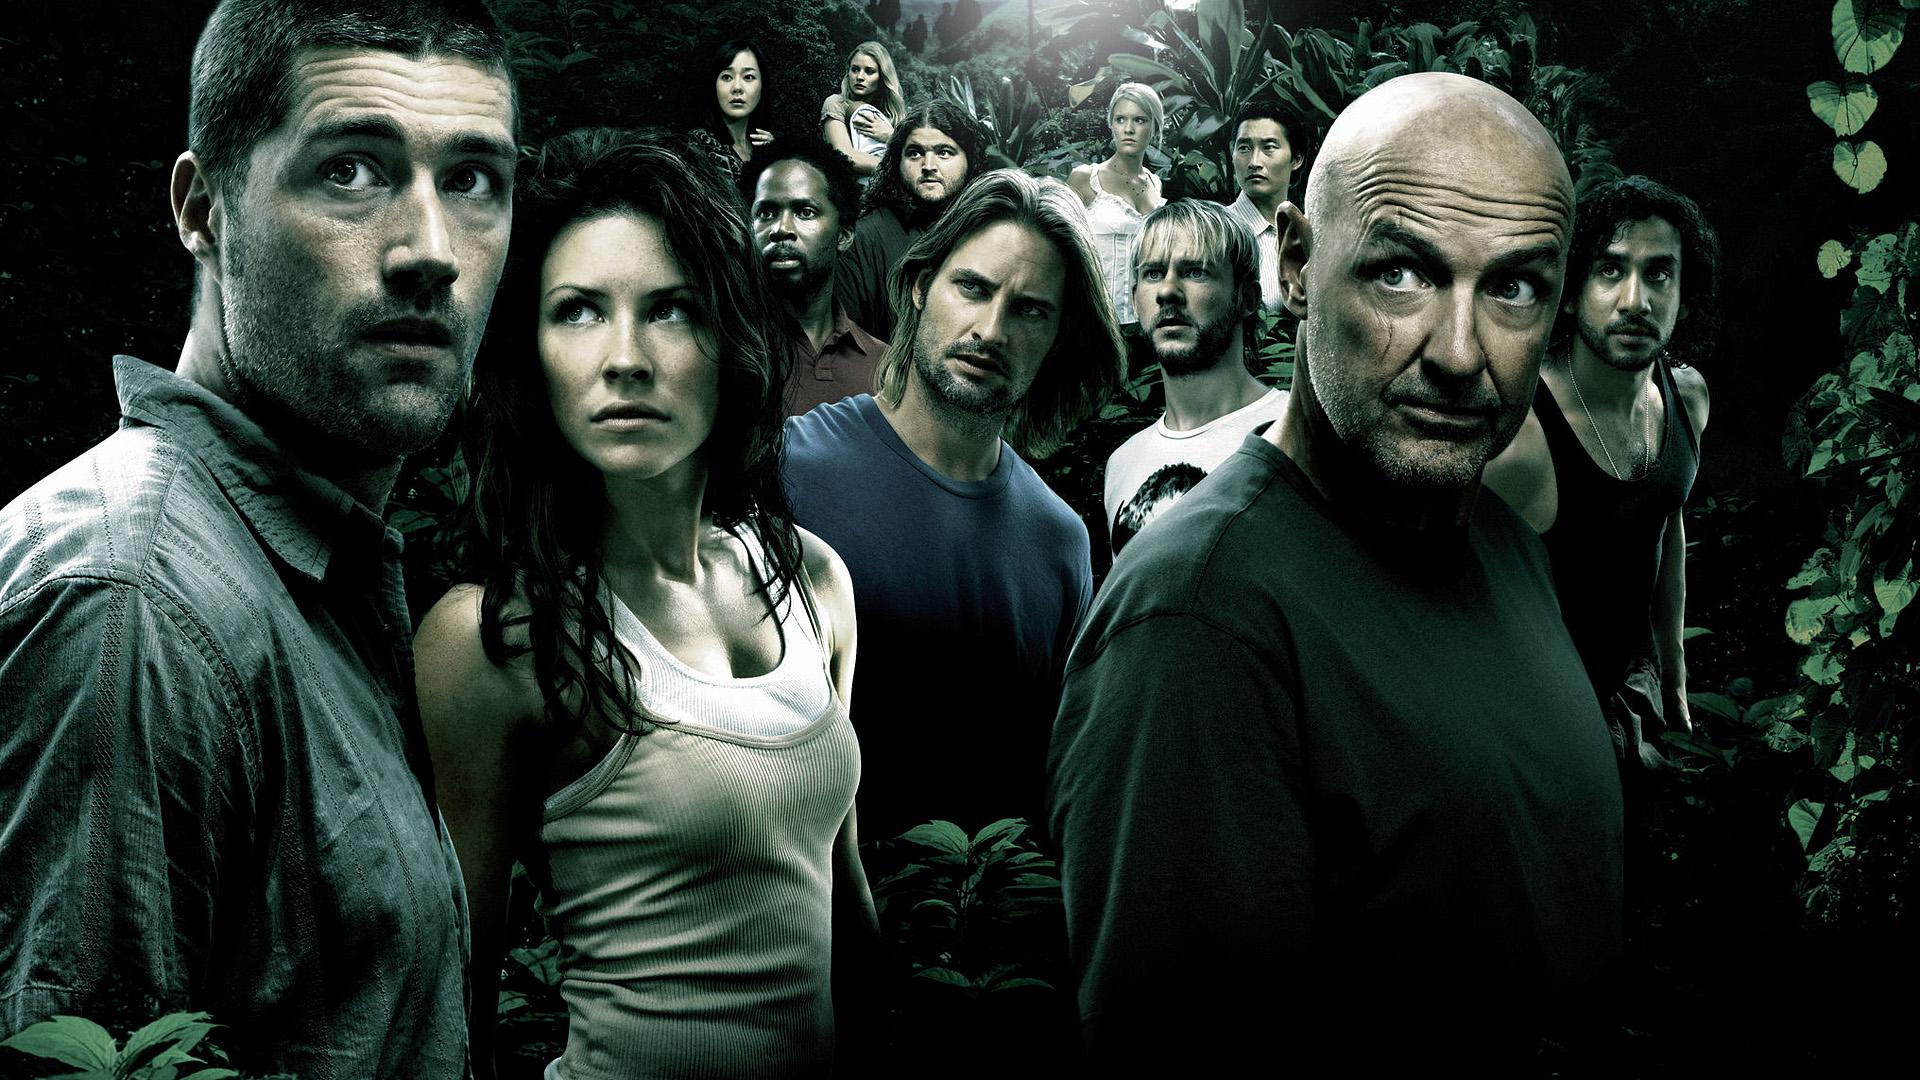 Lost, Heroes en Dexter meeste gedownloade series 2010